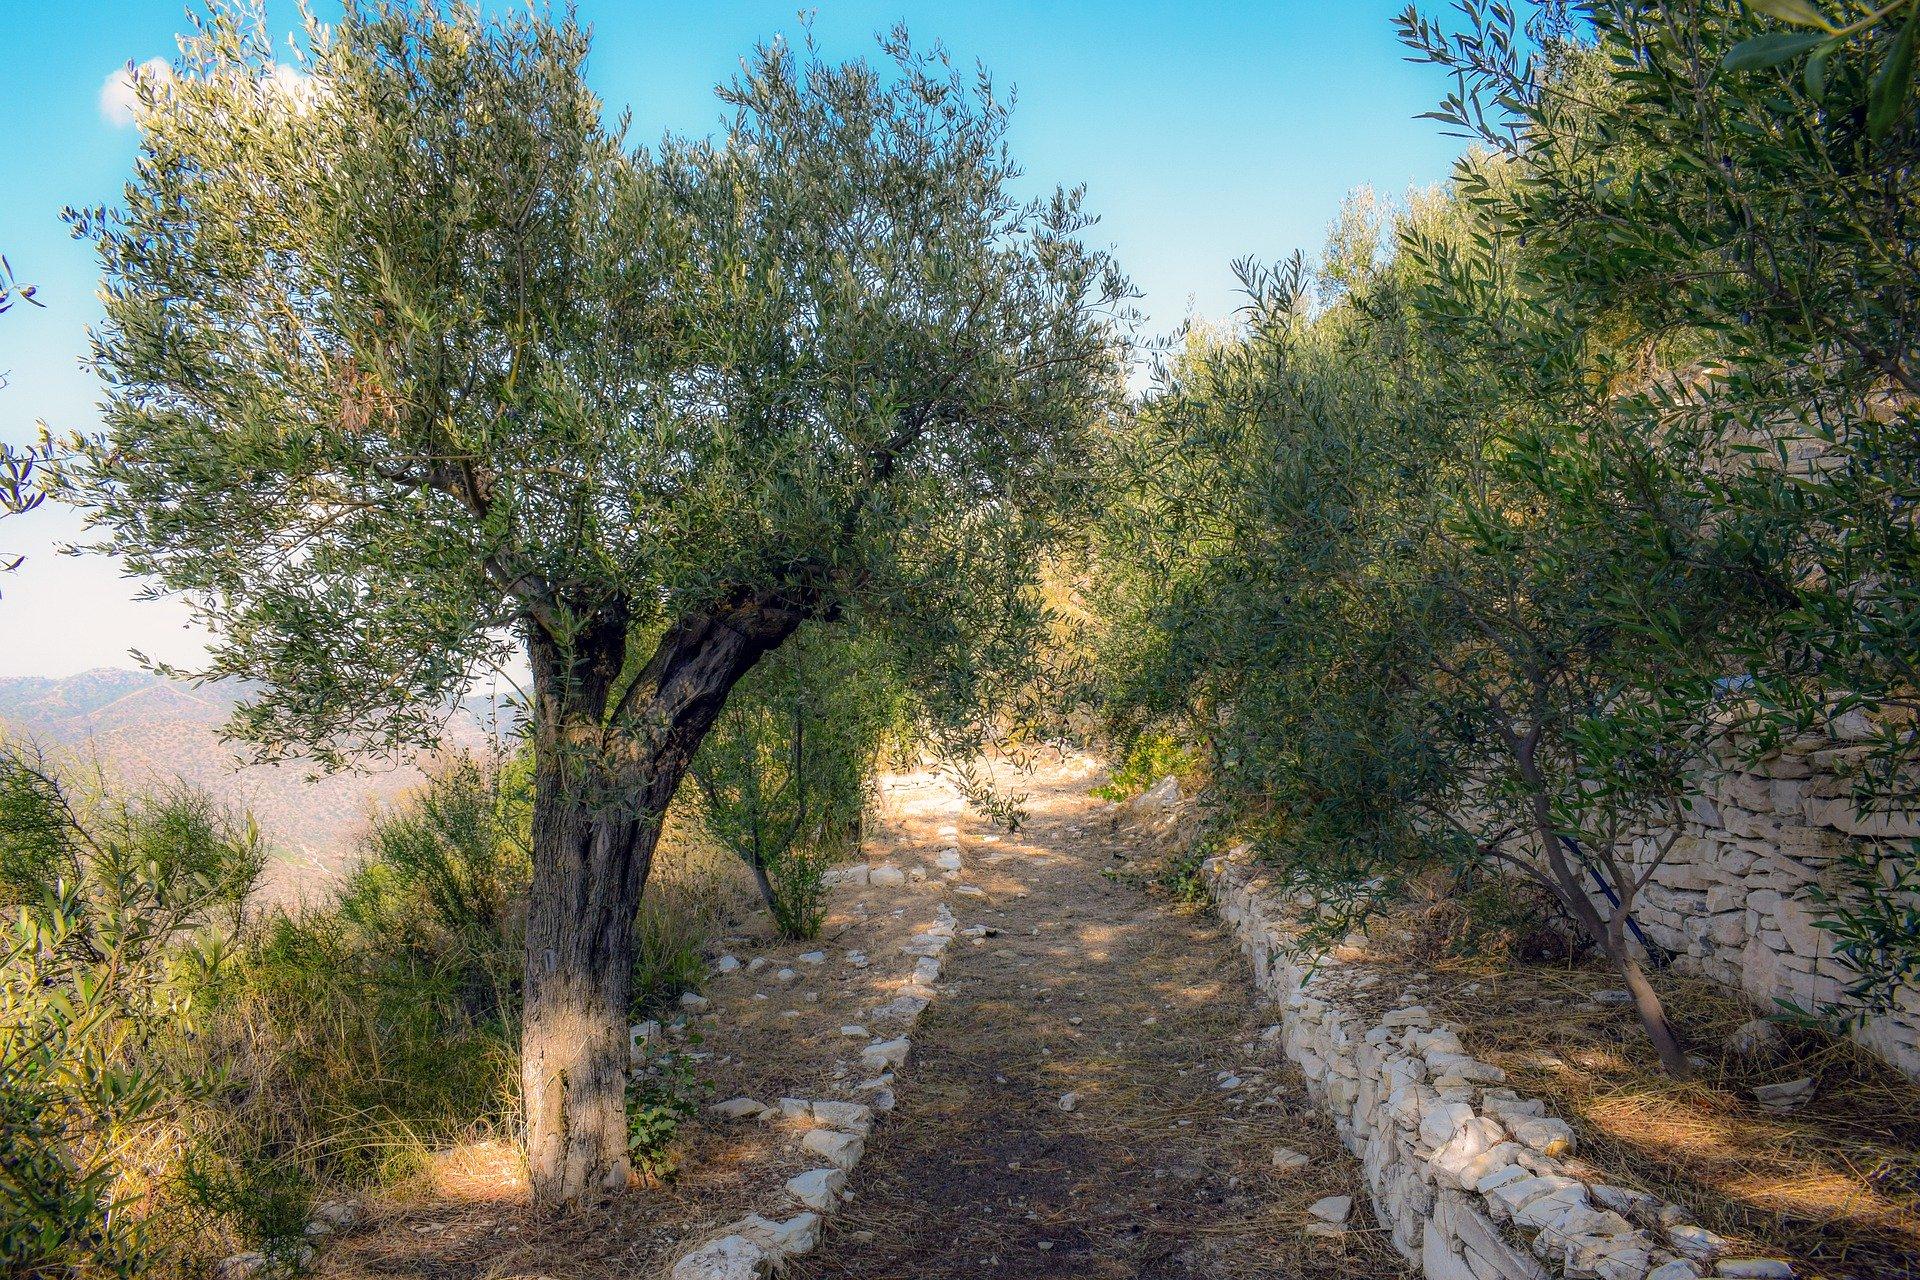 olive-grove-4588219_1920